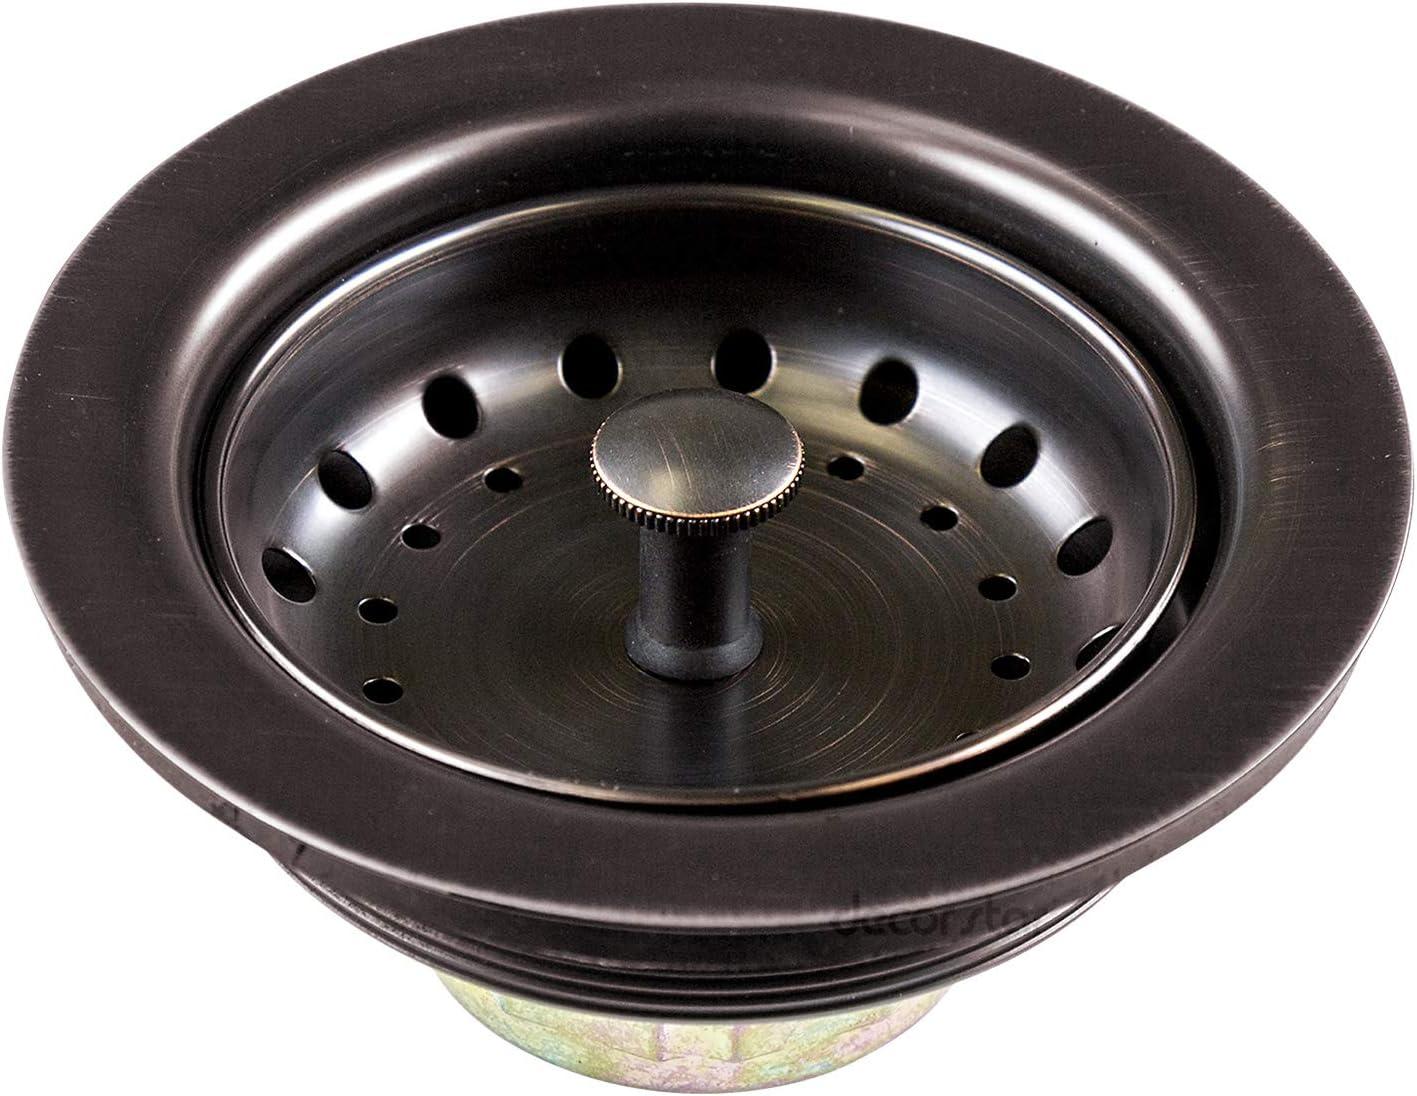 Stainless Steel Oil Rubbed Bronze Decor Star KD-001-O 3 1//2 Drop-In Kitchen//Bar Sink Basket Strainer